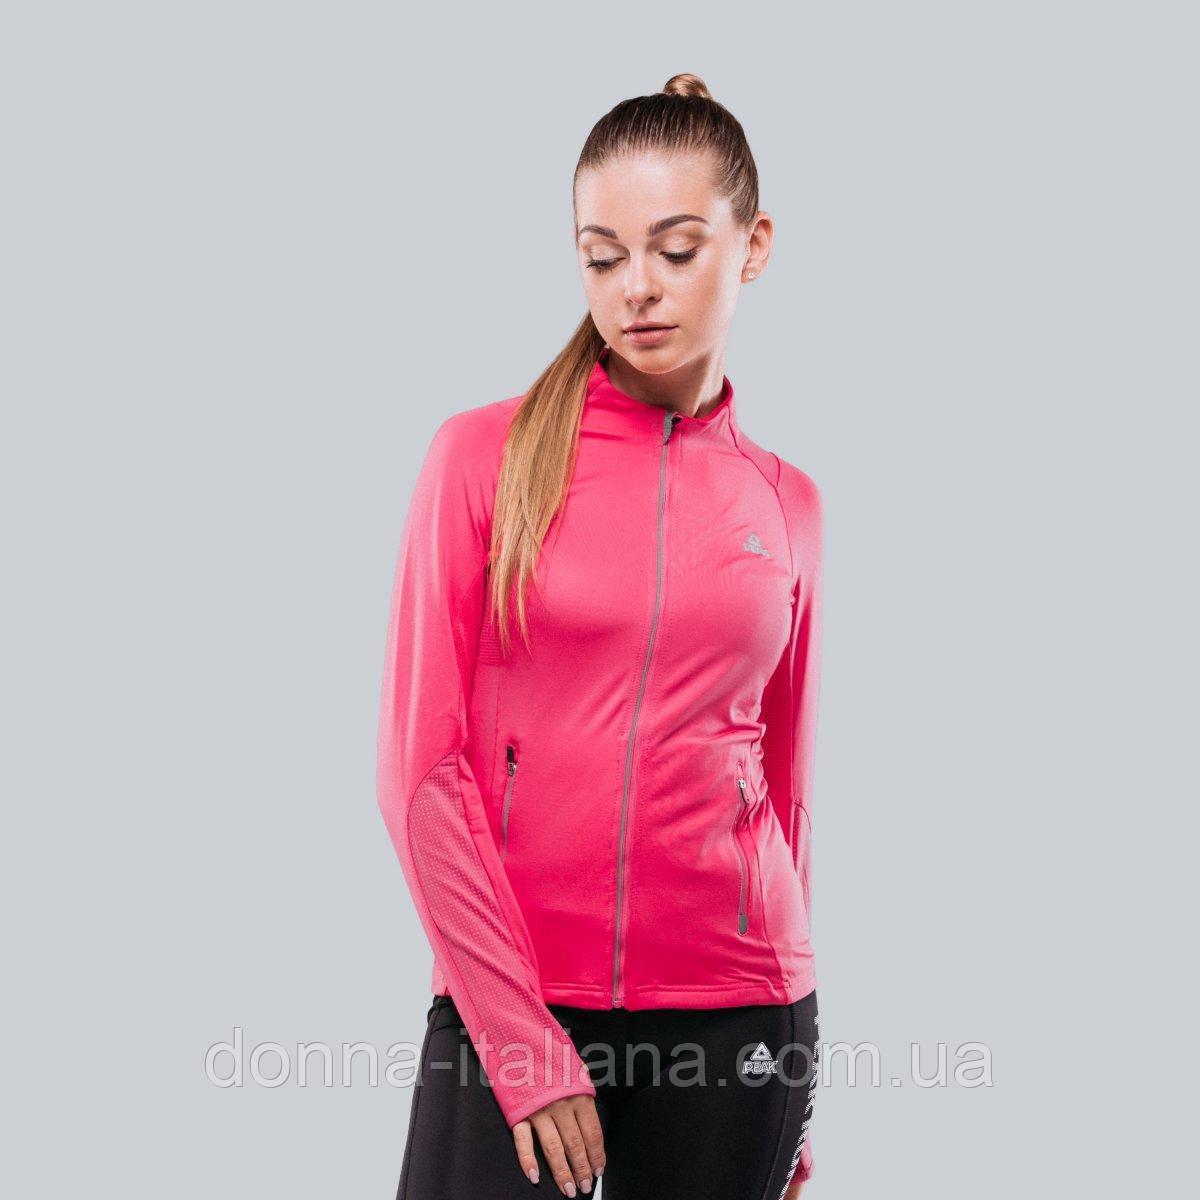 Женская спортивная кофта Peak FW67024-PIN M Розовая (6956251121343)